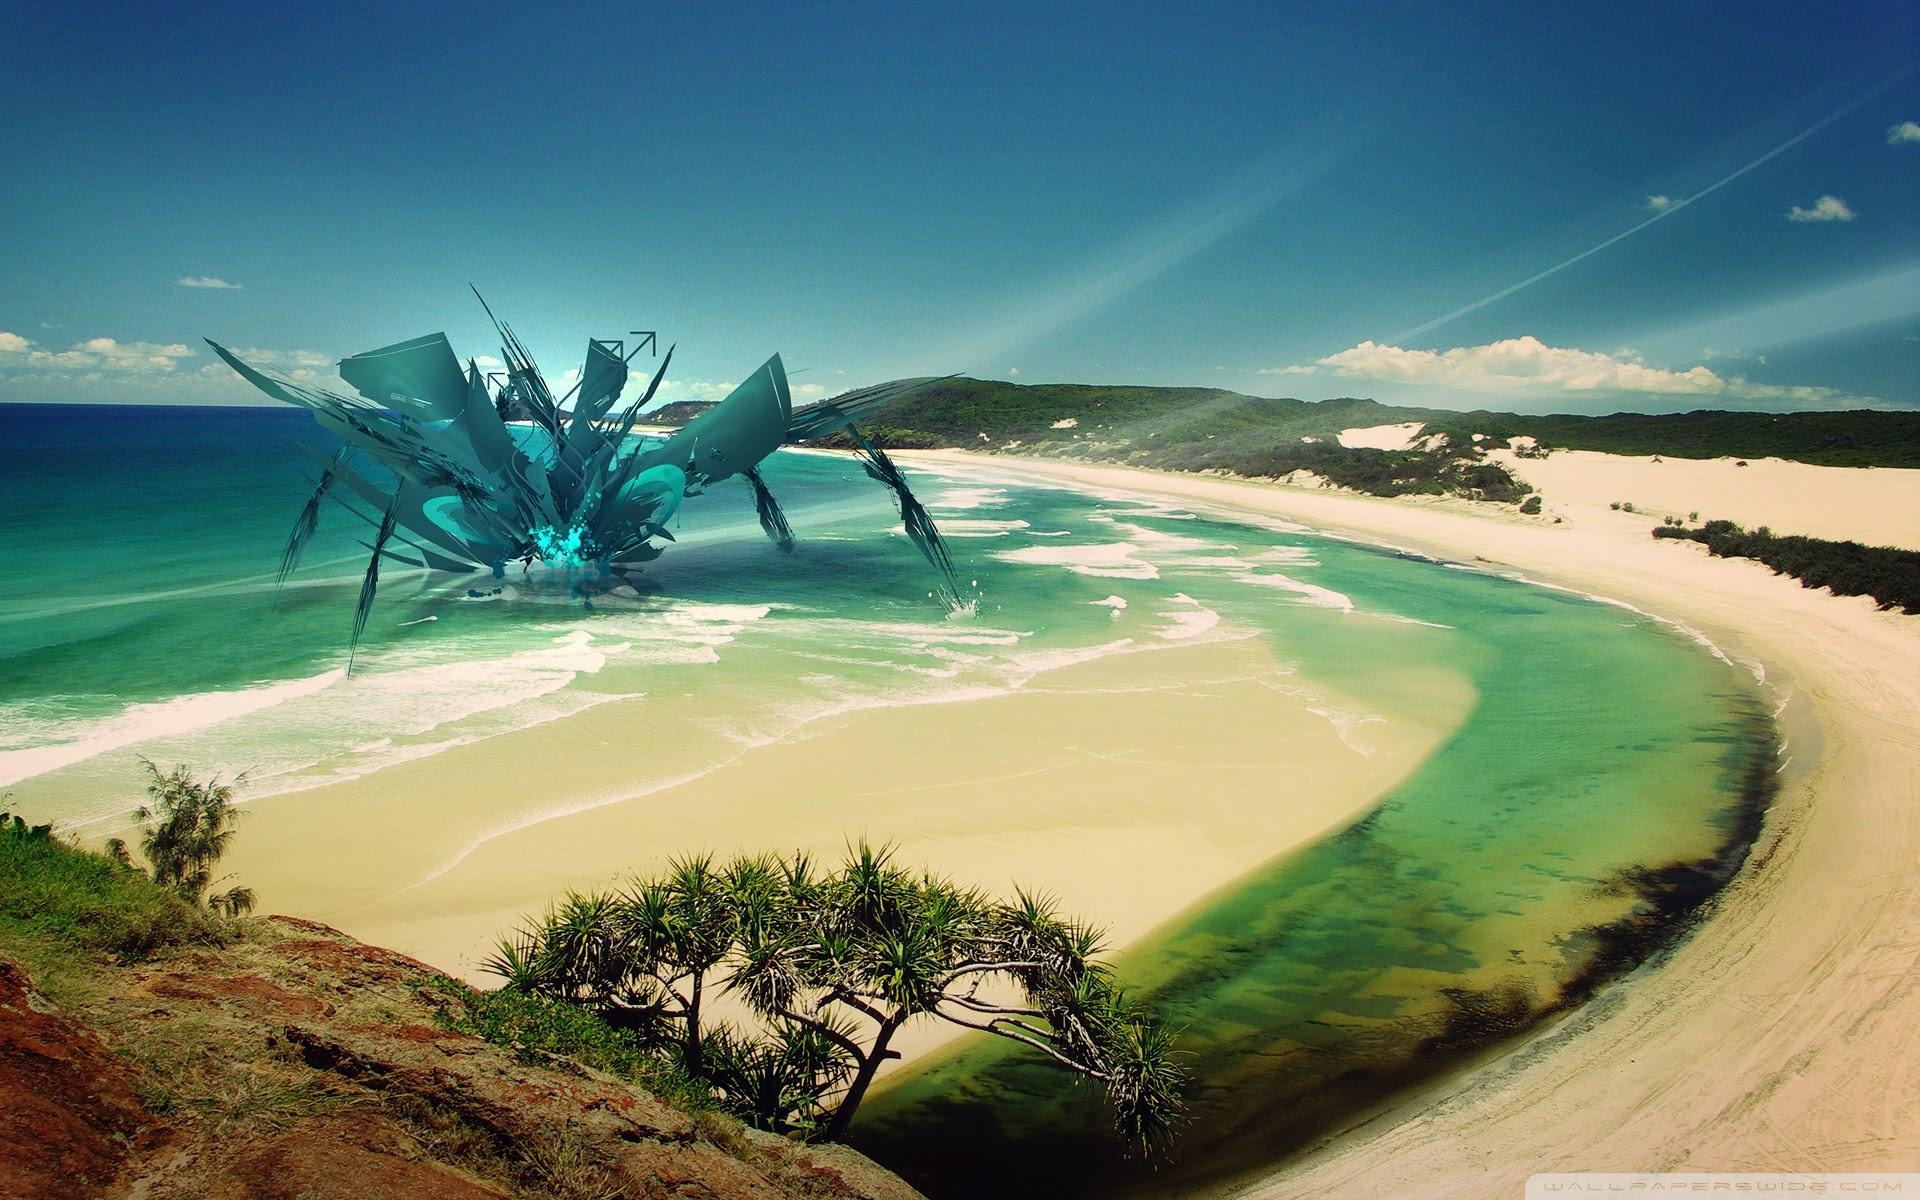 Thursday Beach 4k Hd Desktop Wallpaper For 4k Ultra Hd Tv